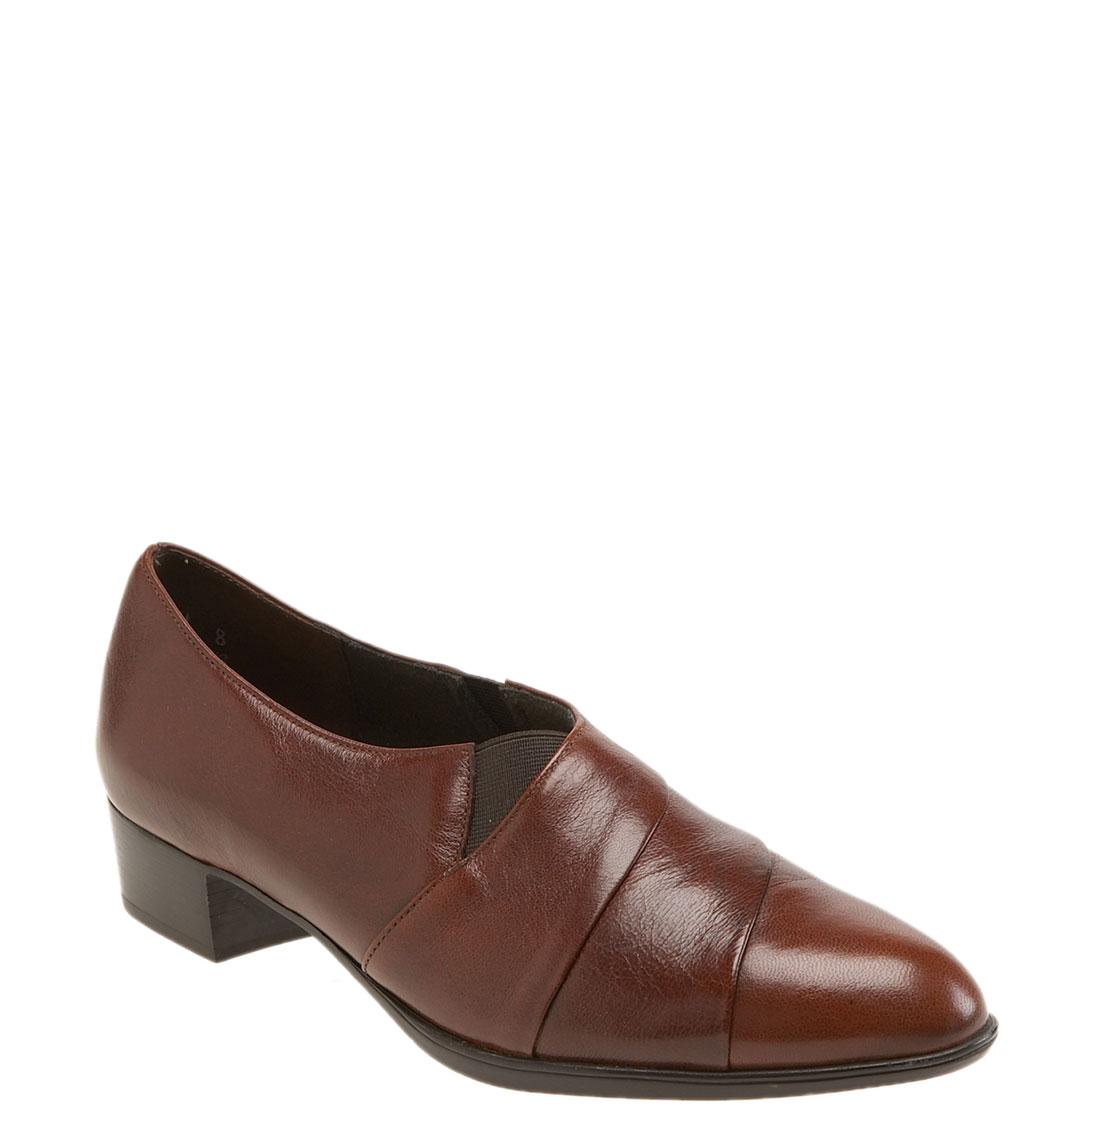 Zappos Womens Shoes Munro